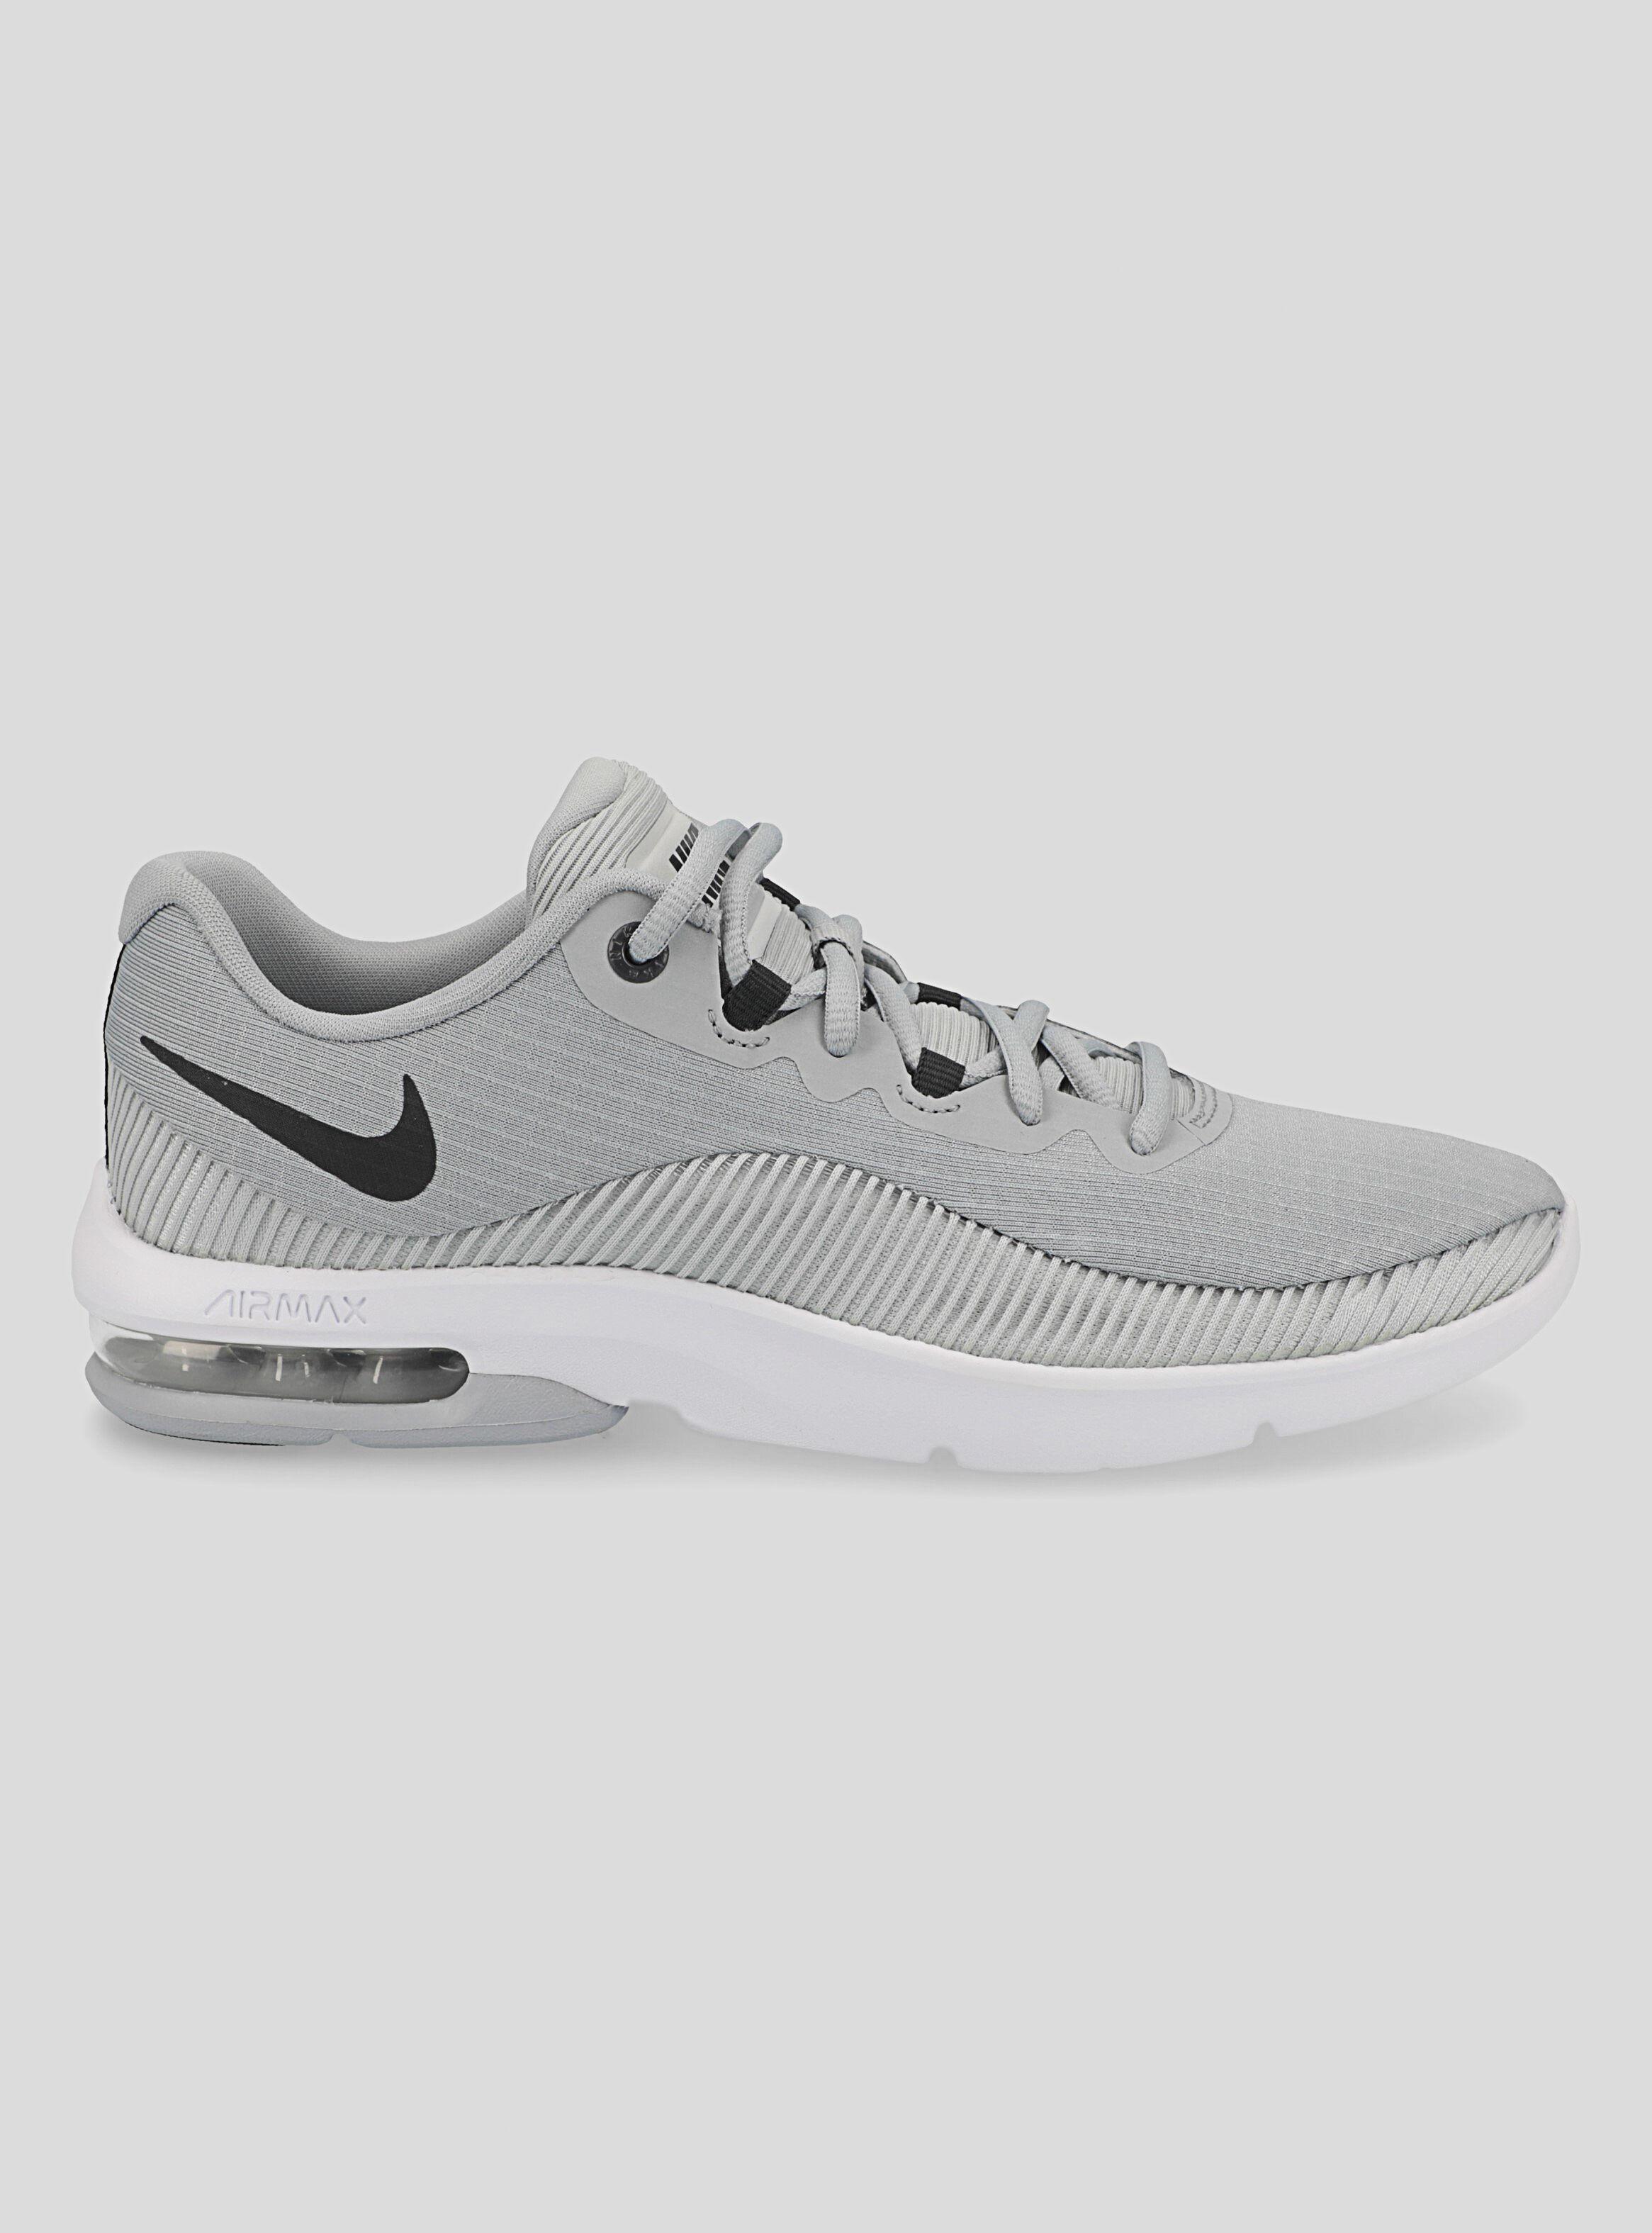 Zapatilla Nike Air Max Advantage 2 Urbana Hombre en